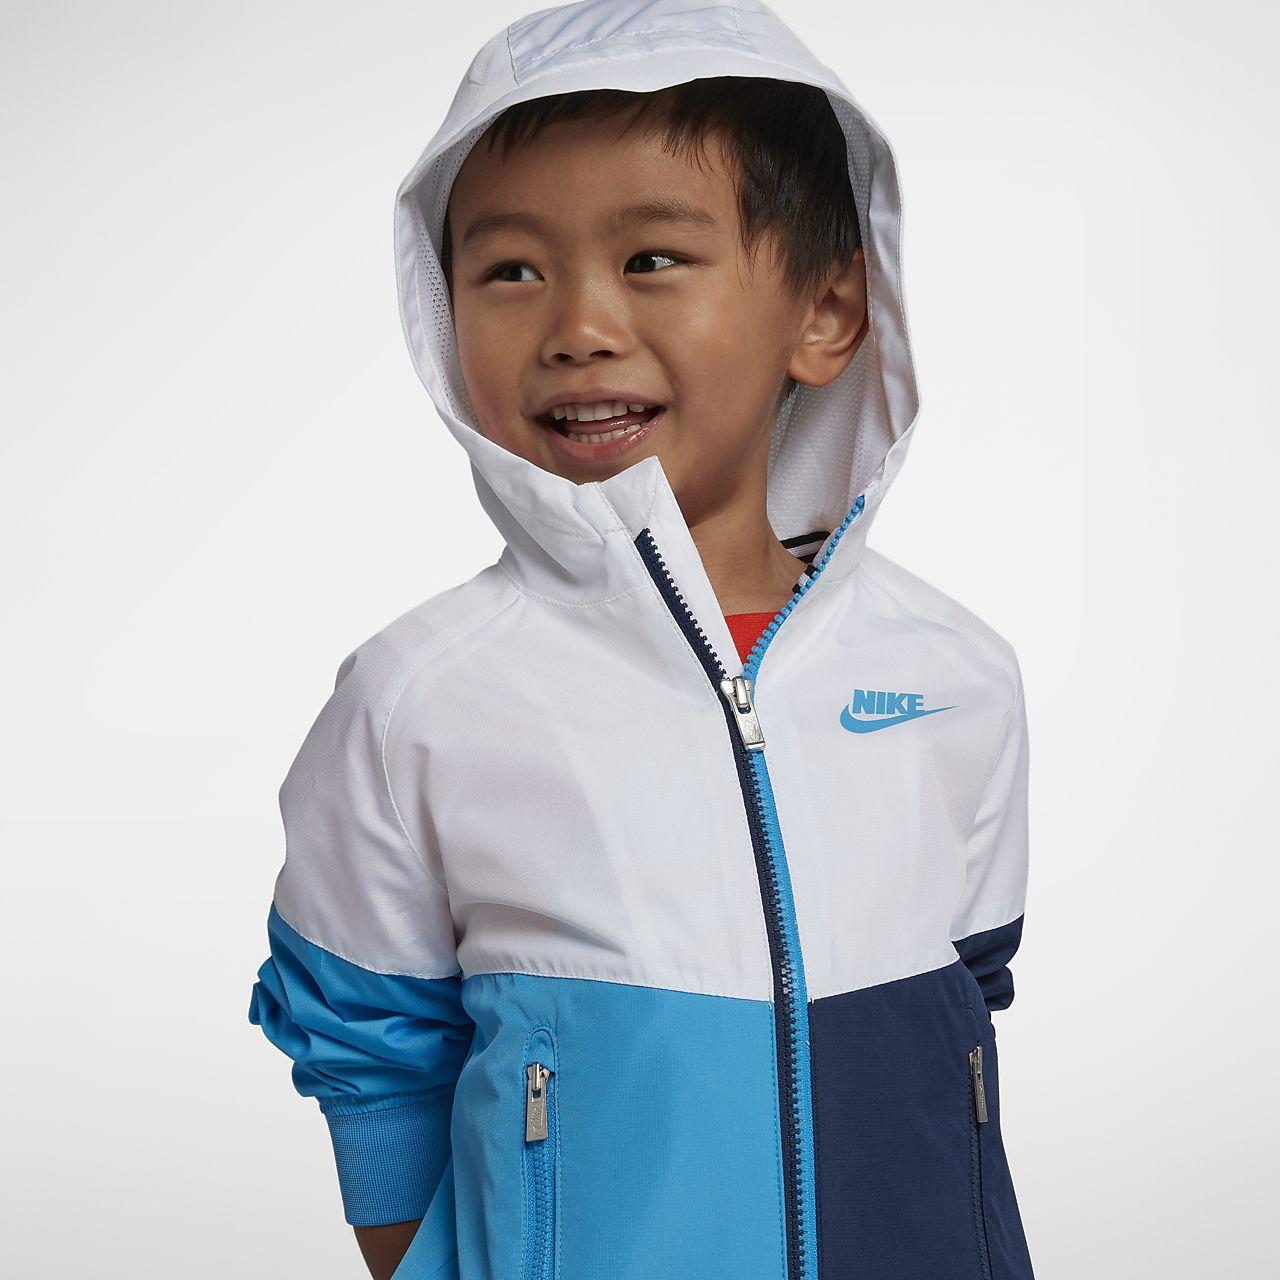 Veste Pour Petit Enfant Sportswear Windrunner Nike rqZwr0R